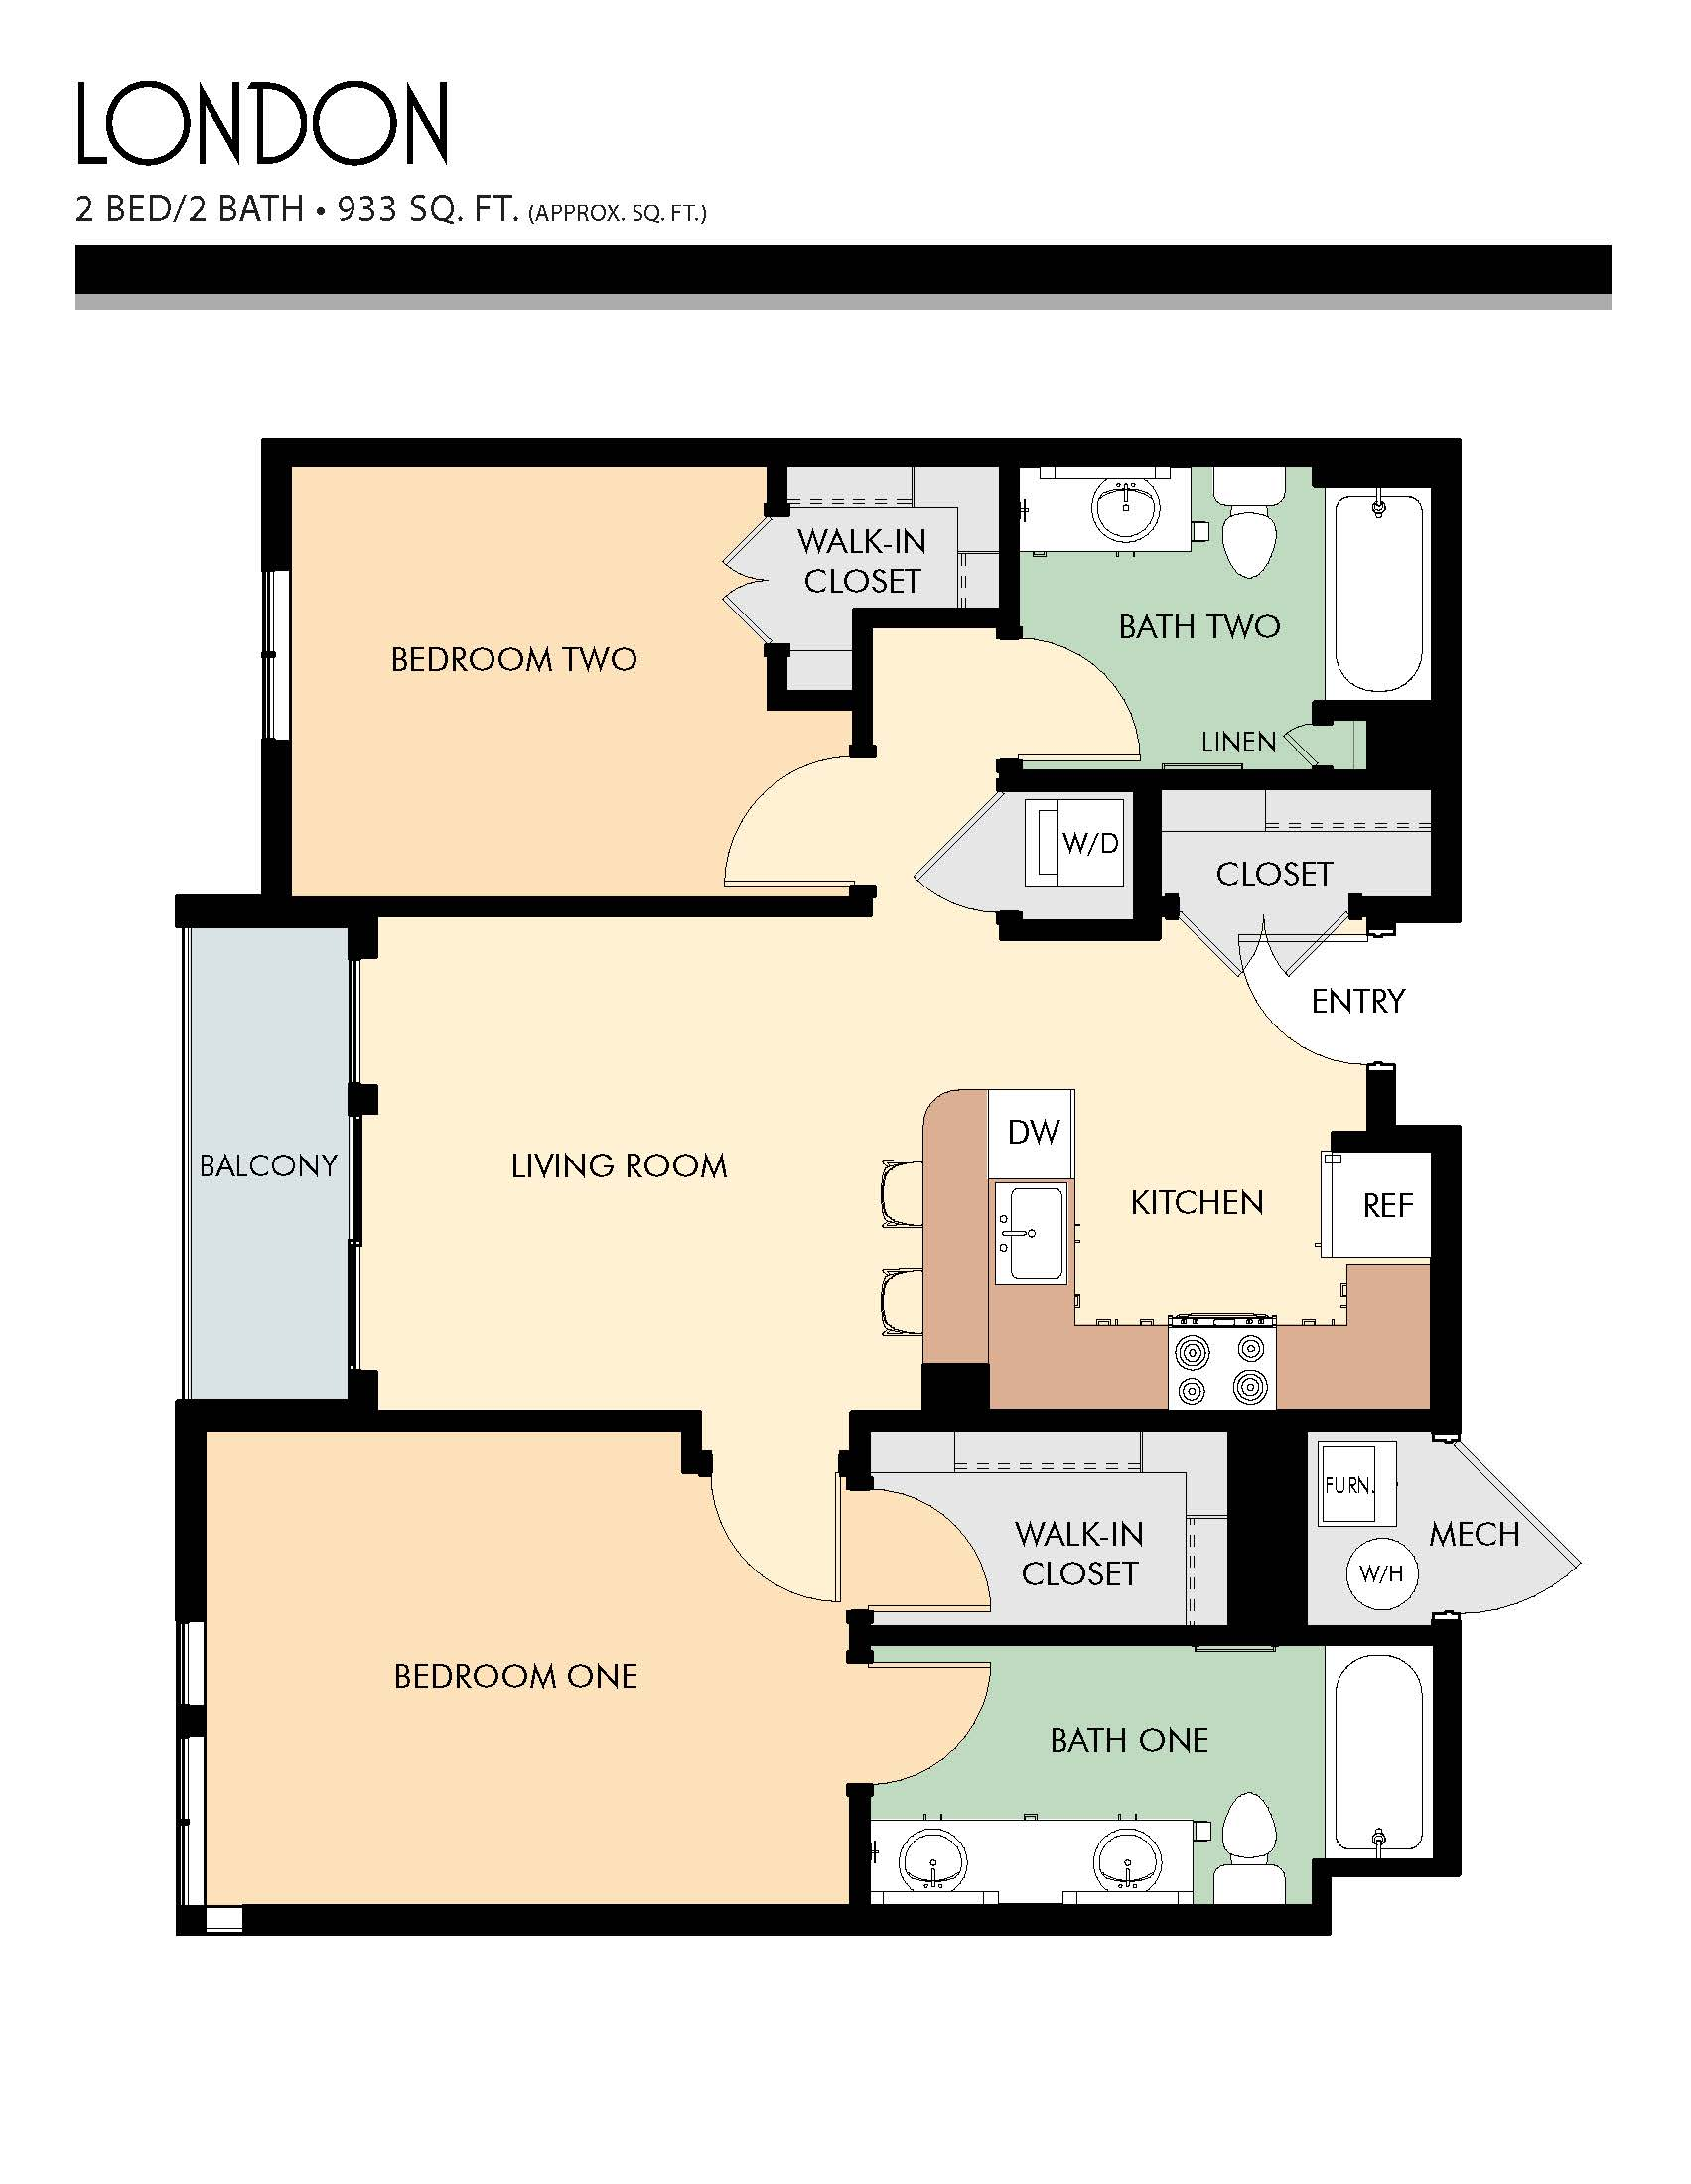 London floor plans - 2 Bed / 2 Bath (933 Sq Ft)